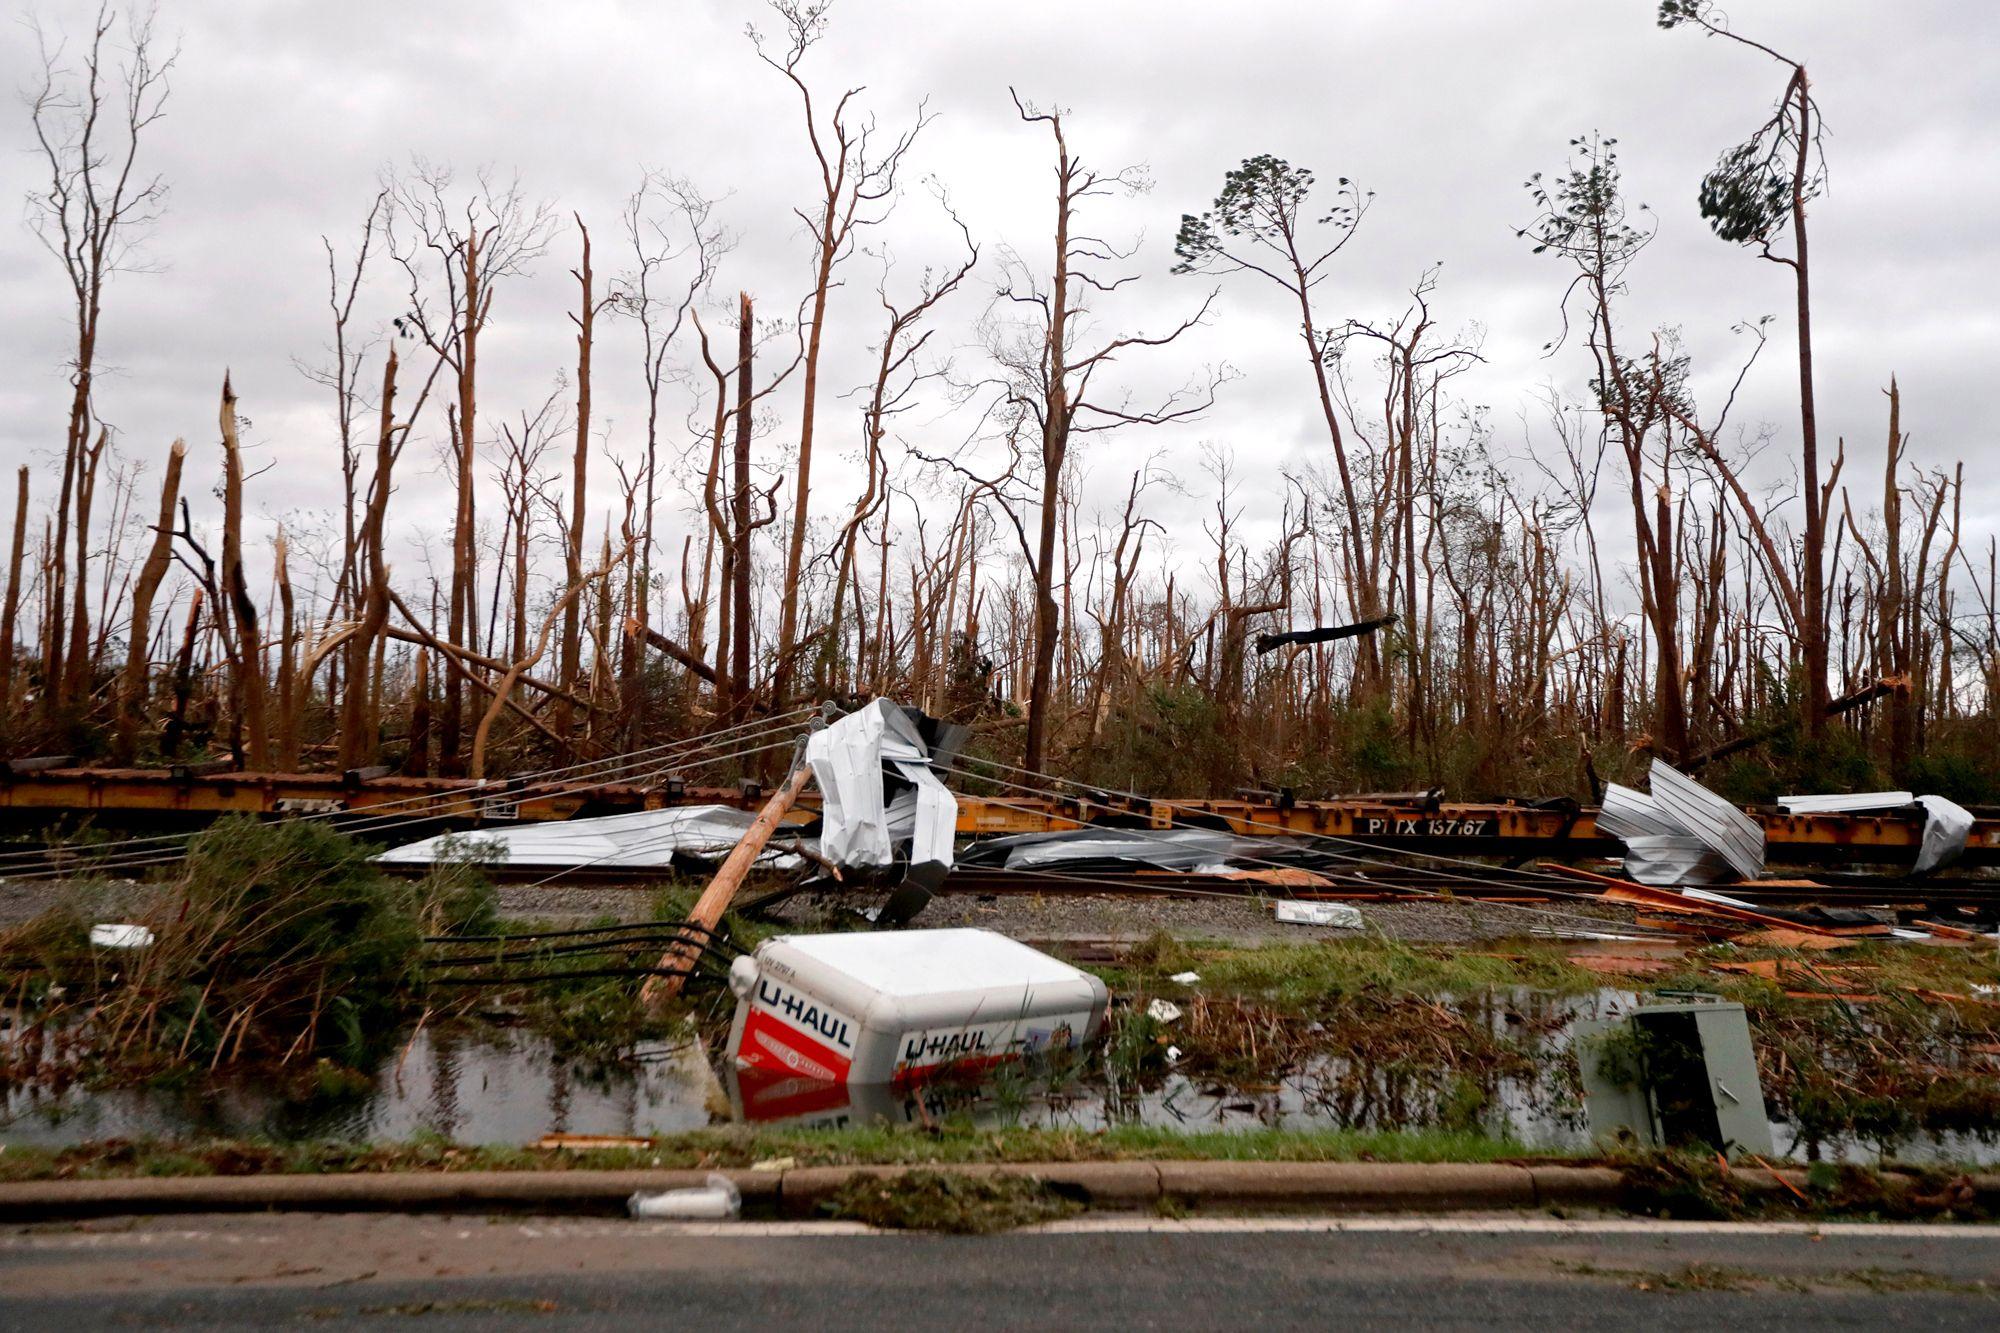 At Least 2 Dead Including Child After Hurricane Michael Slams Florida Weakens Over Georgia Panama City Panama Path Of Destruction Hurricane